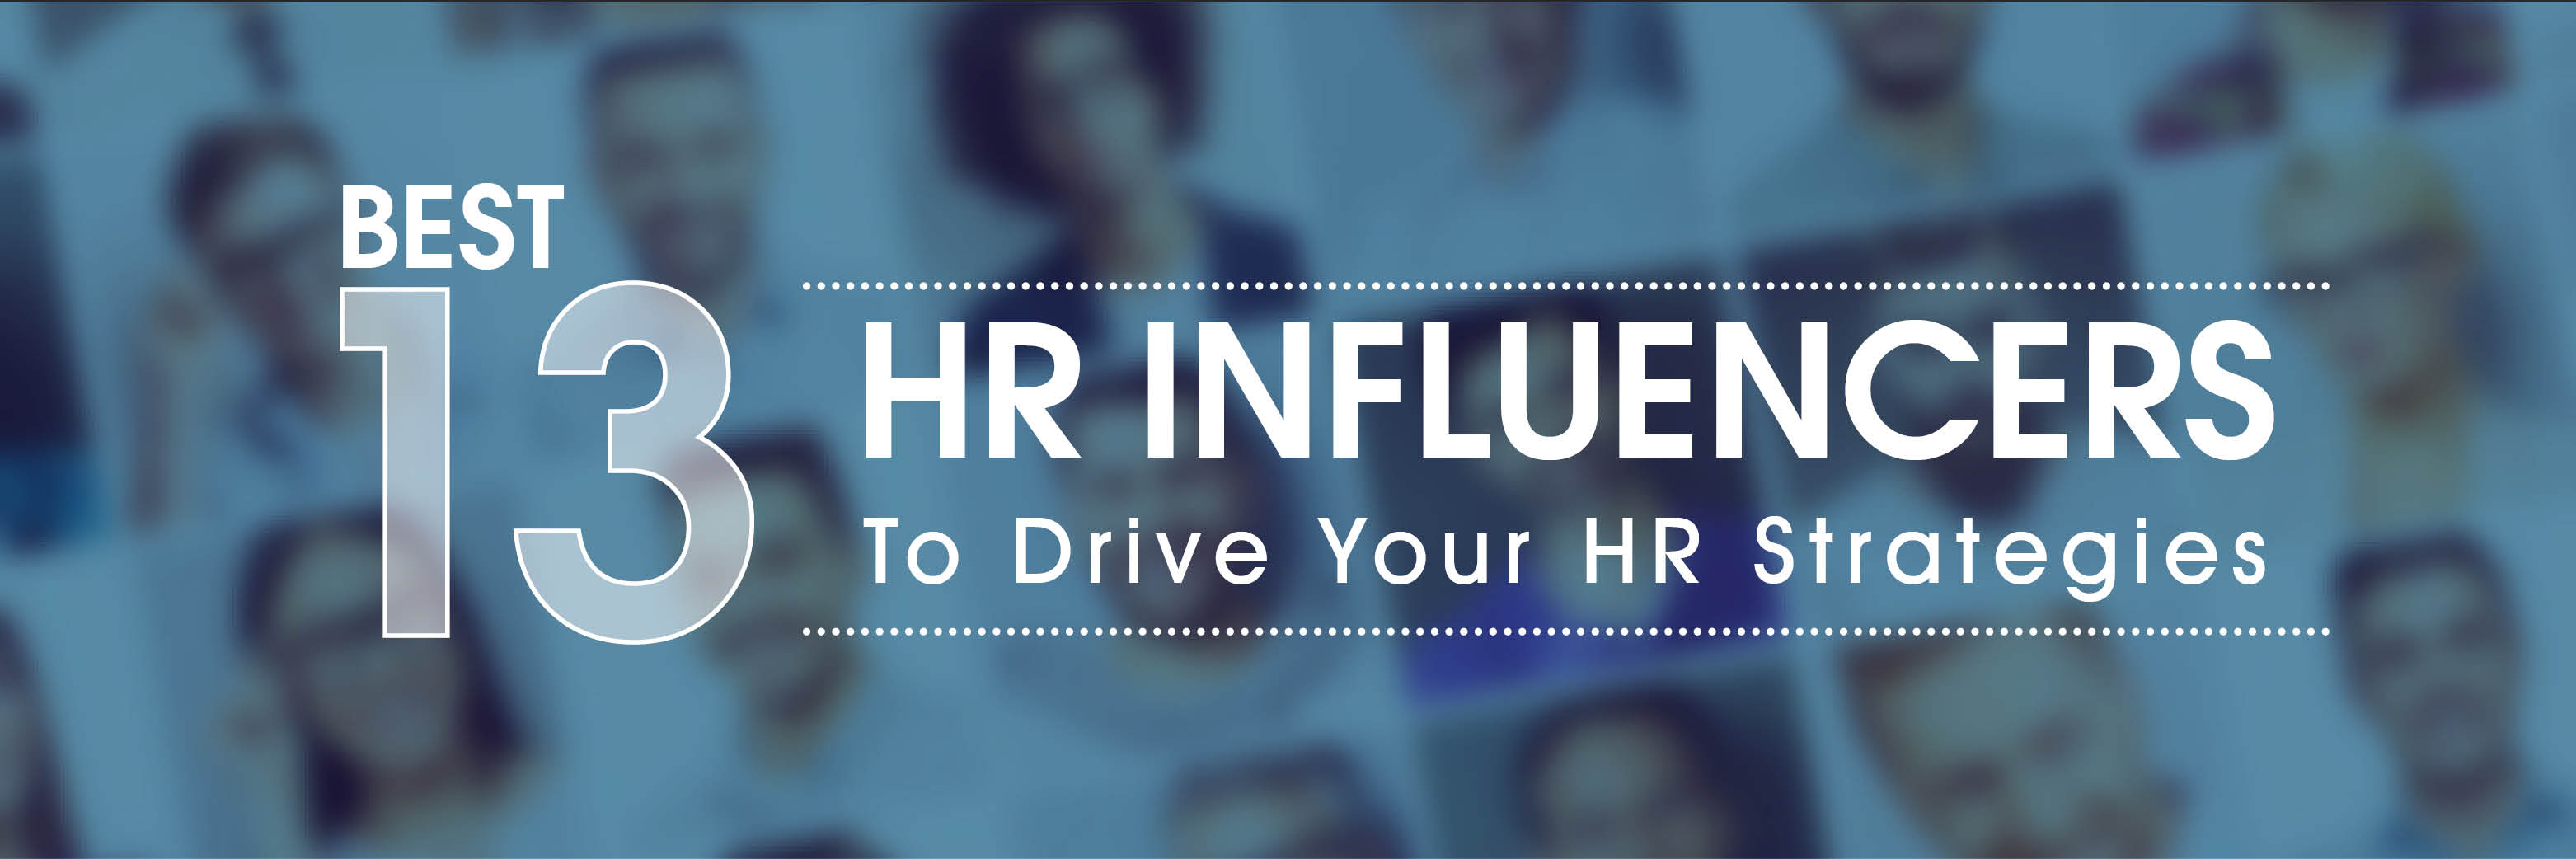 Top 13 HR Influencers Around The World